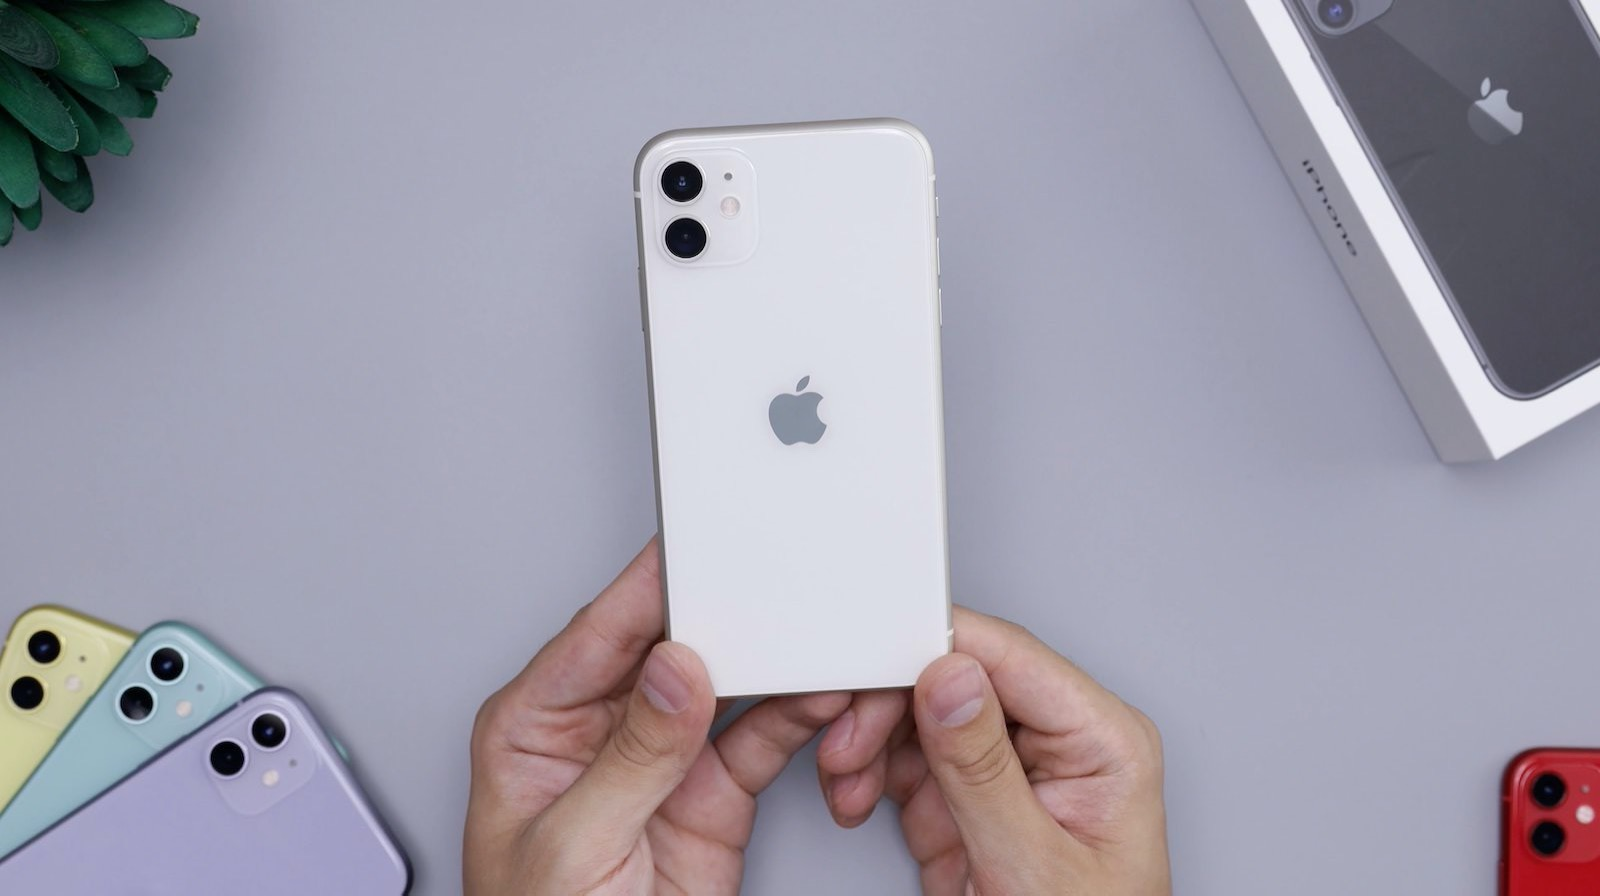 Daniel romero TK8 T5NHpwM unsplash iphone 11 white